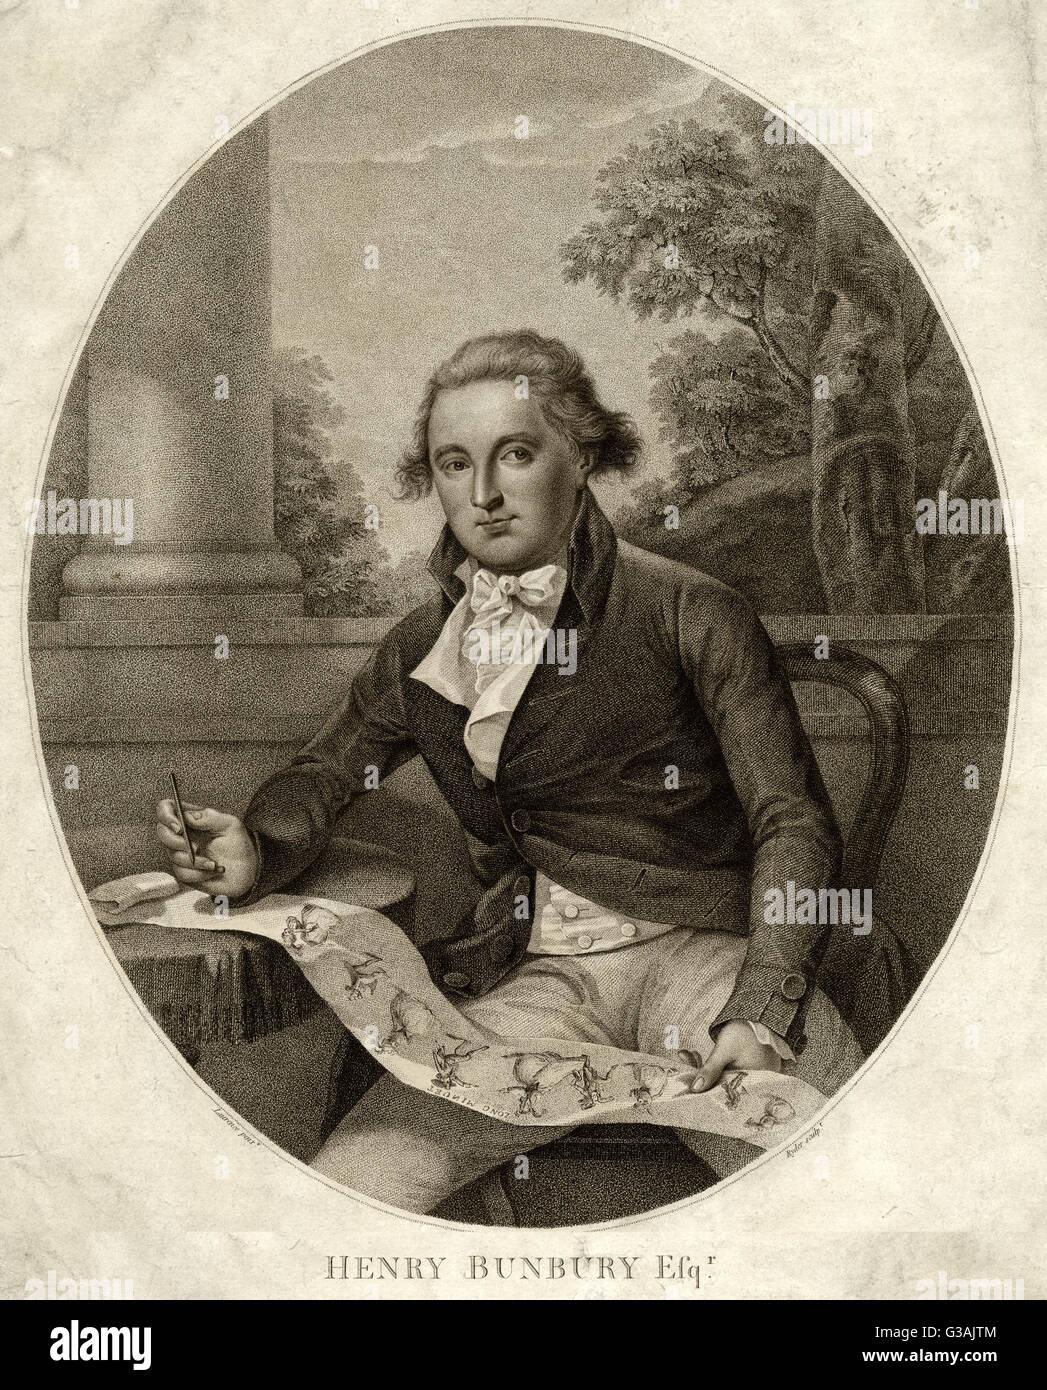 Henry William Stock Photos & Henry William Stock Images - Alamy